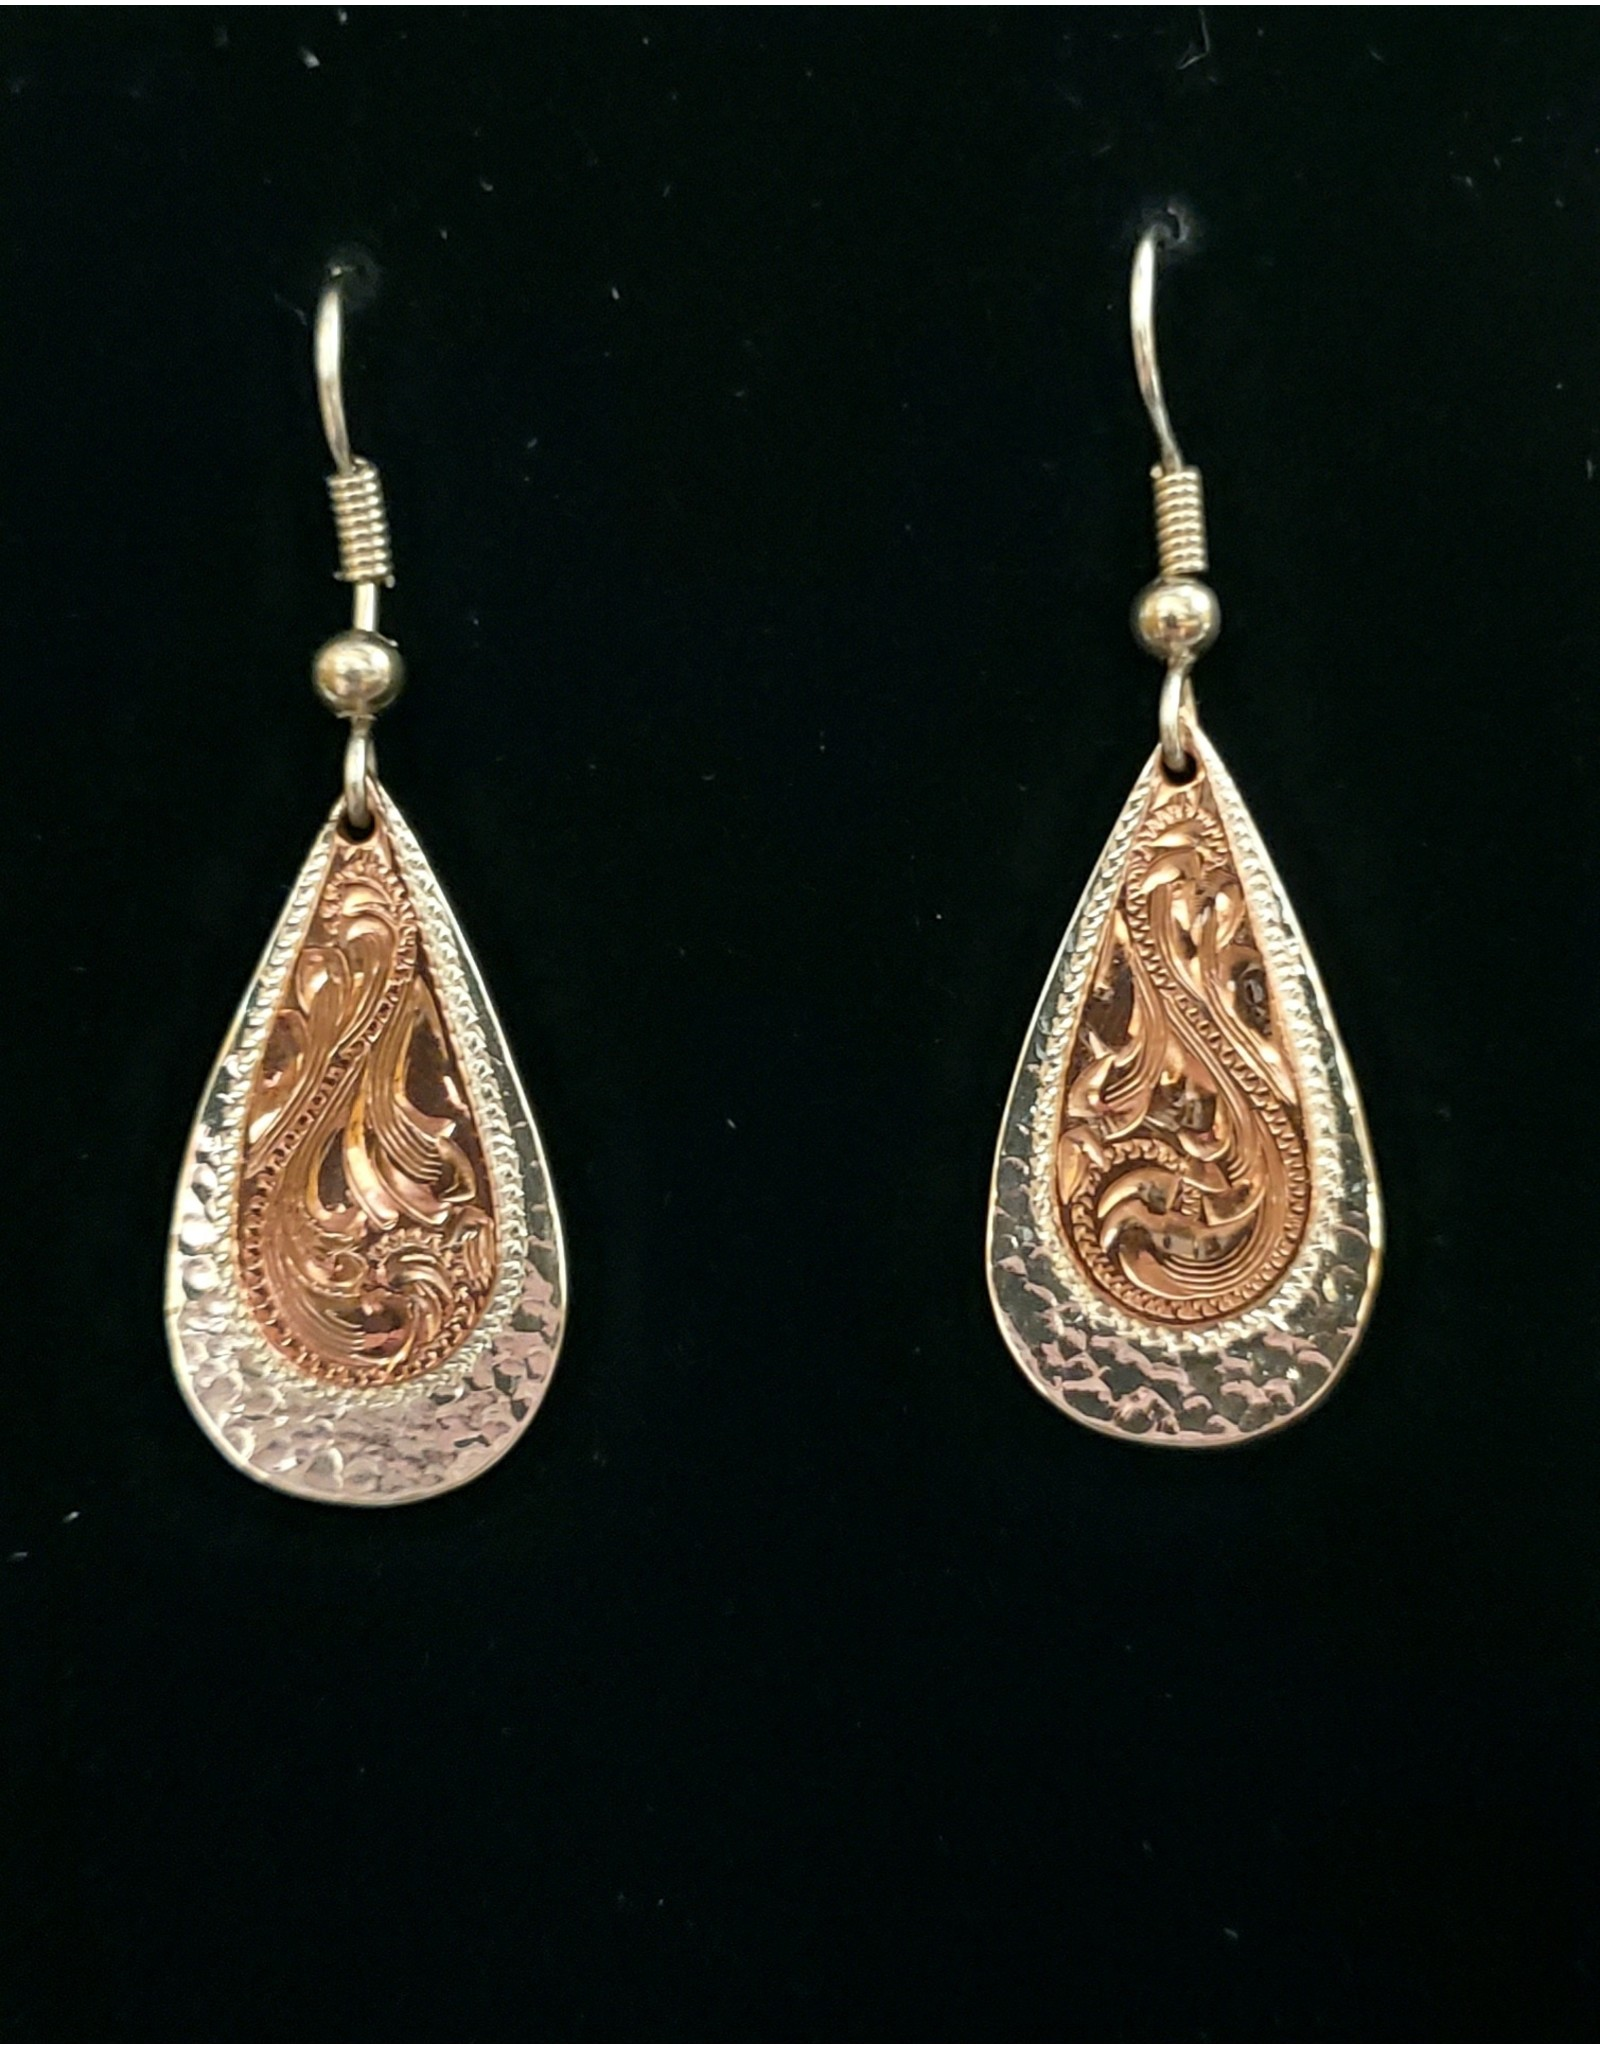 The Smokey Mountains Earrings